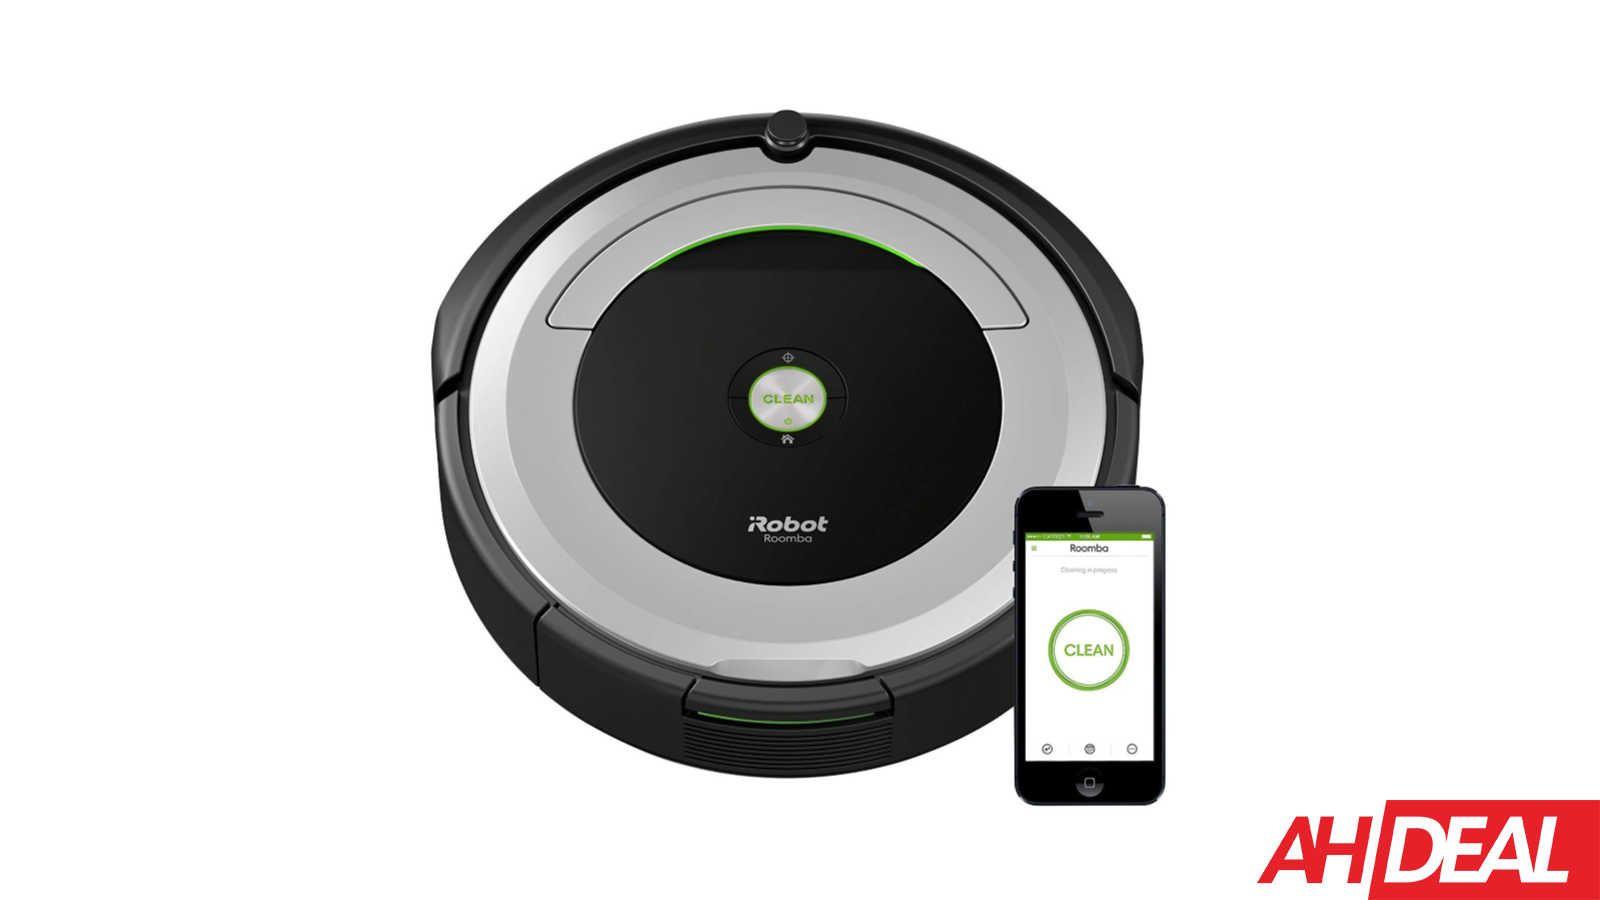 6c7c6db910420e193fbba3e06ff05e8a - How To Get Roomba 690 To Clean Whole House